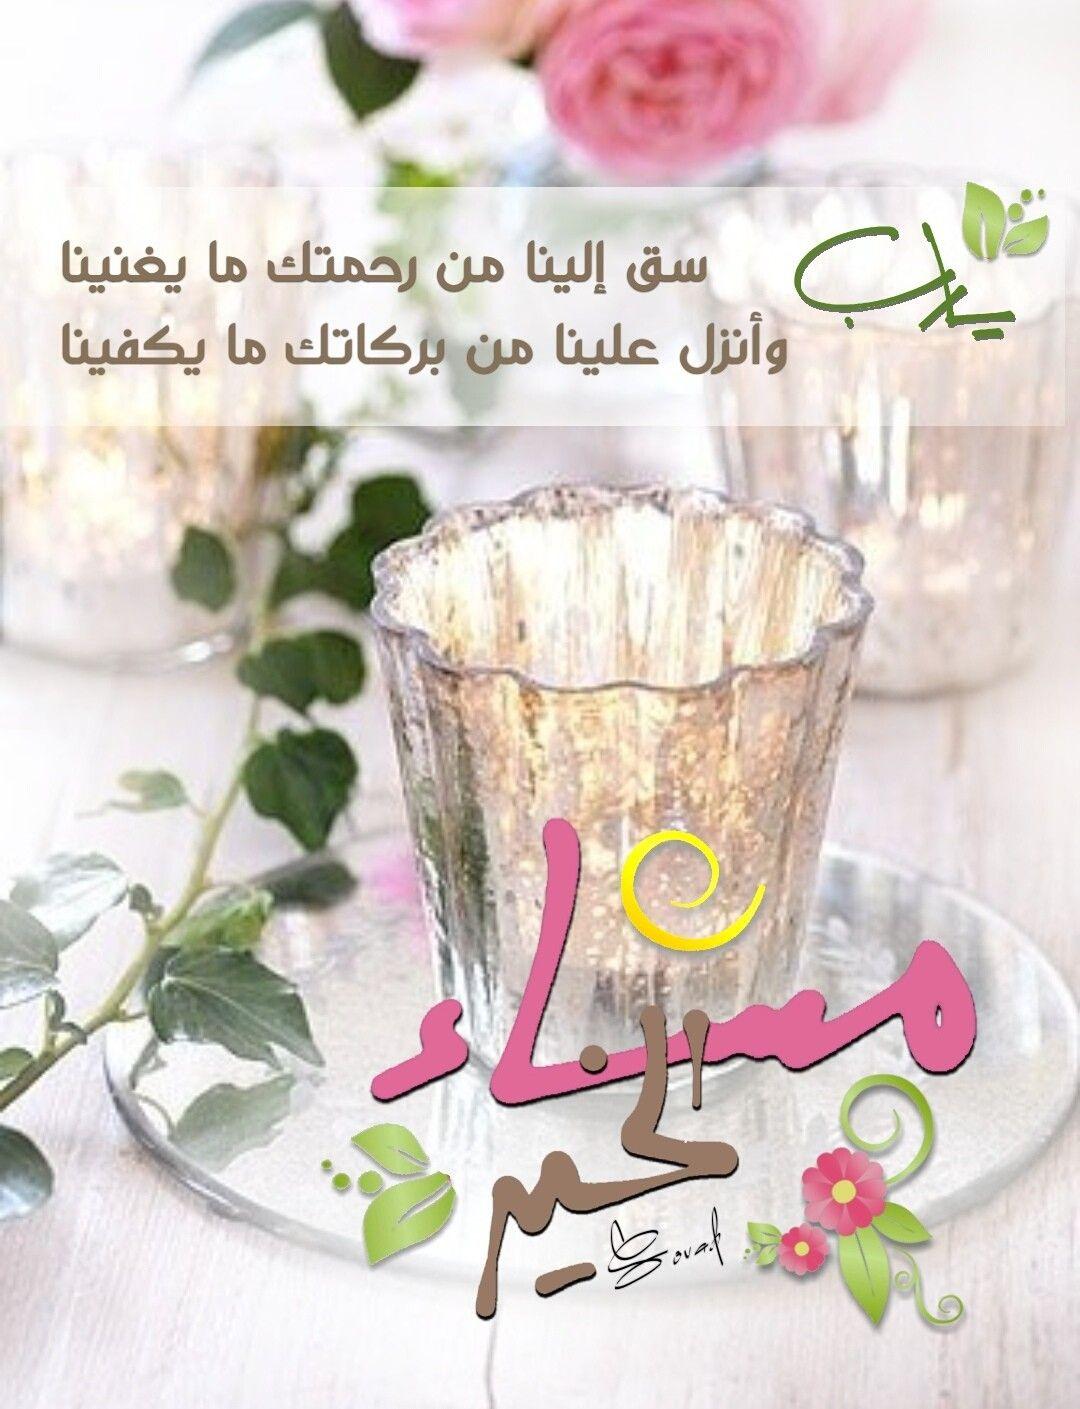 مساء الخير Evening Greetings Good Evening Beautiful Rose Flowers